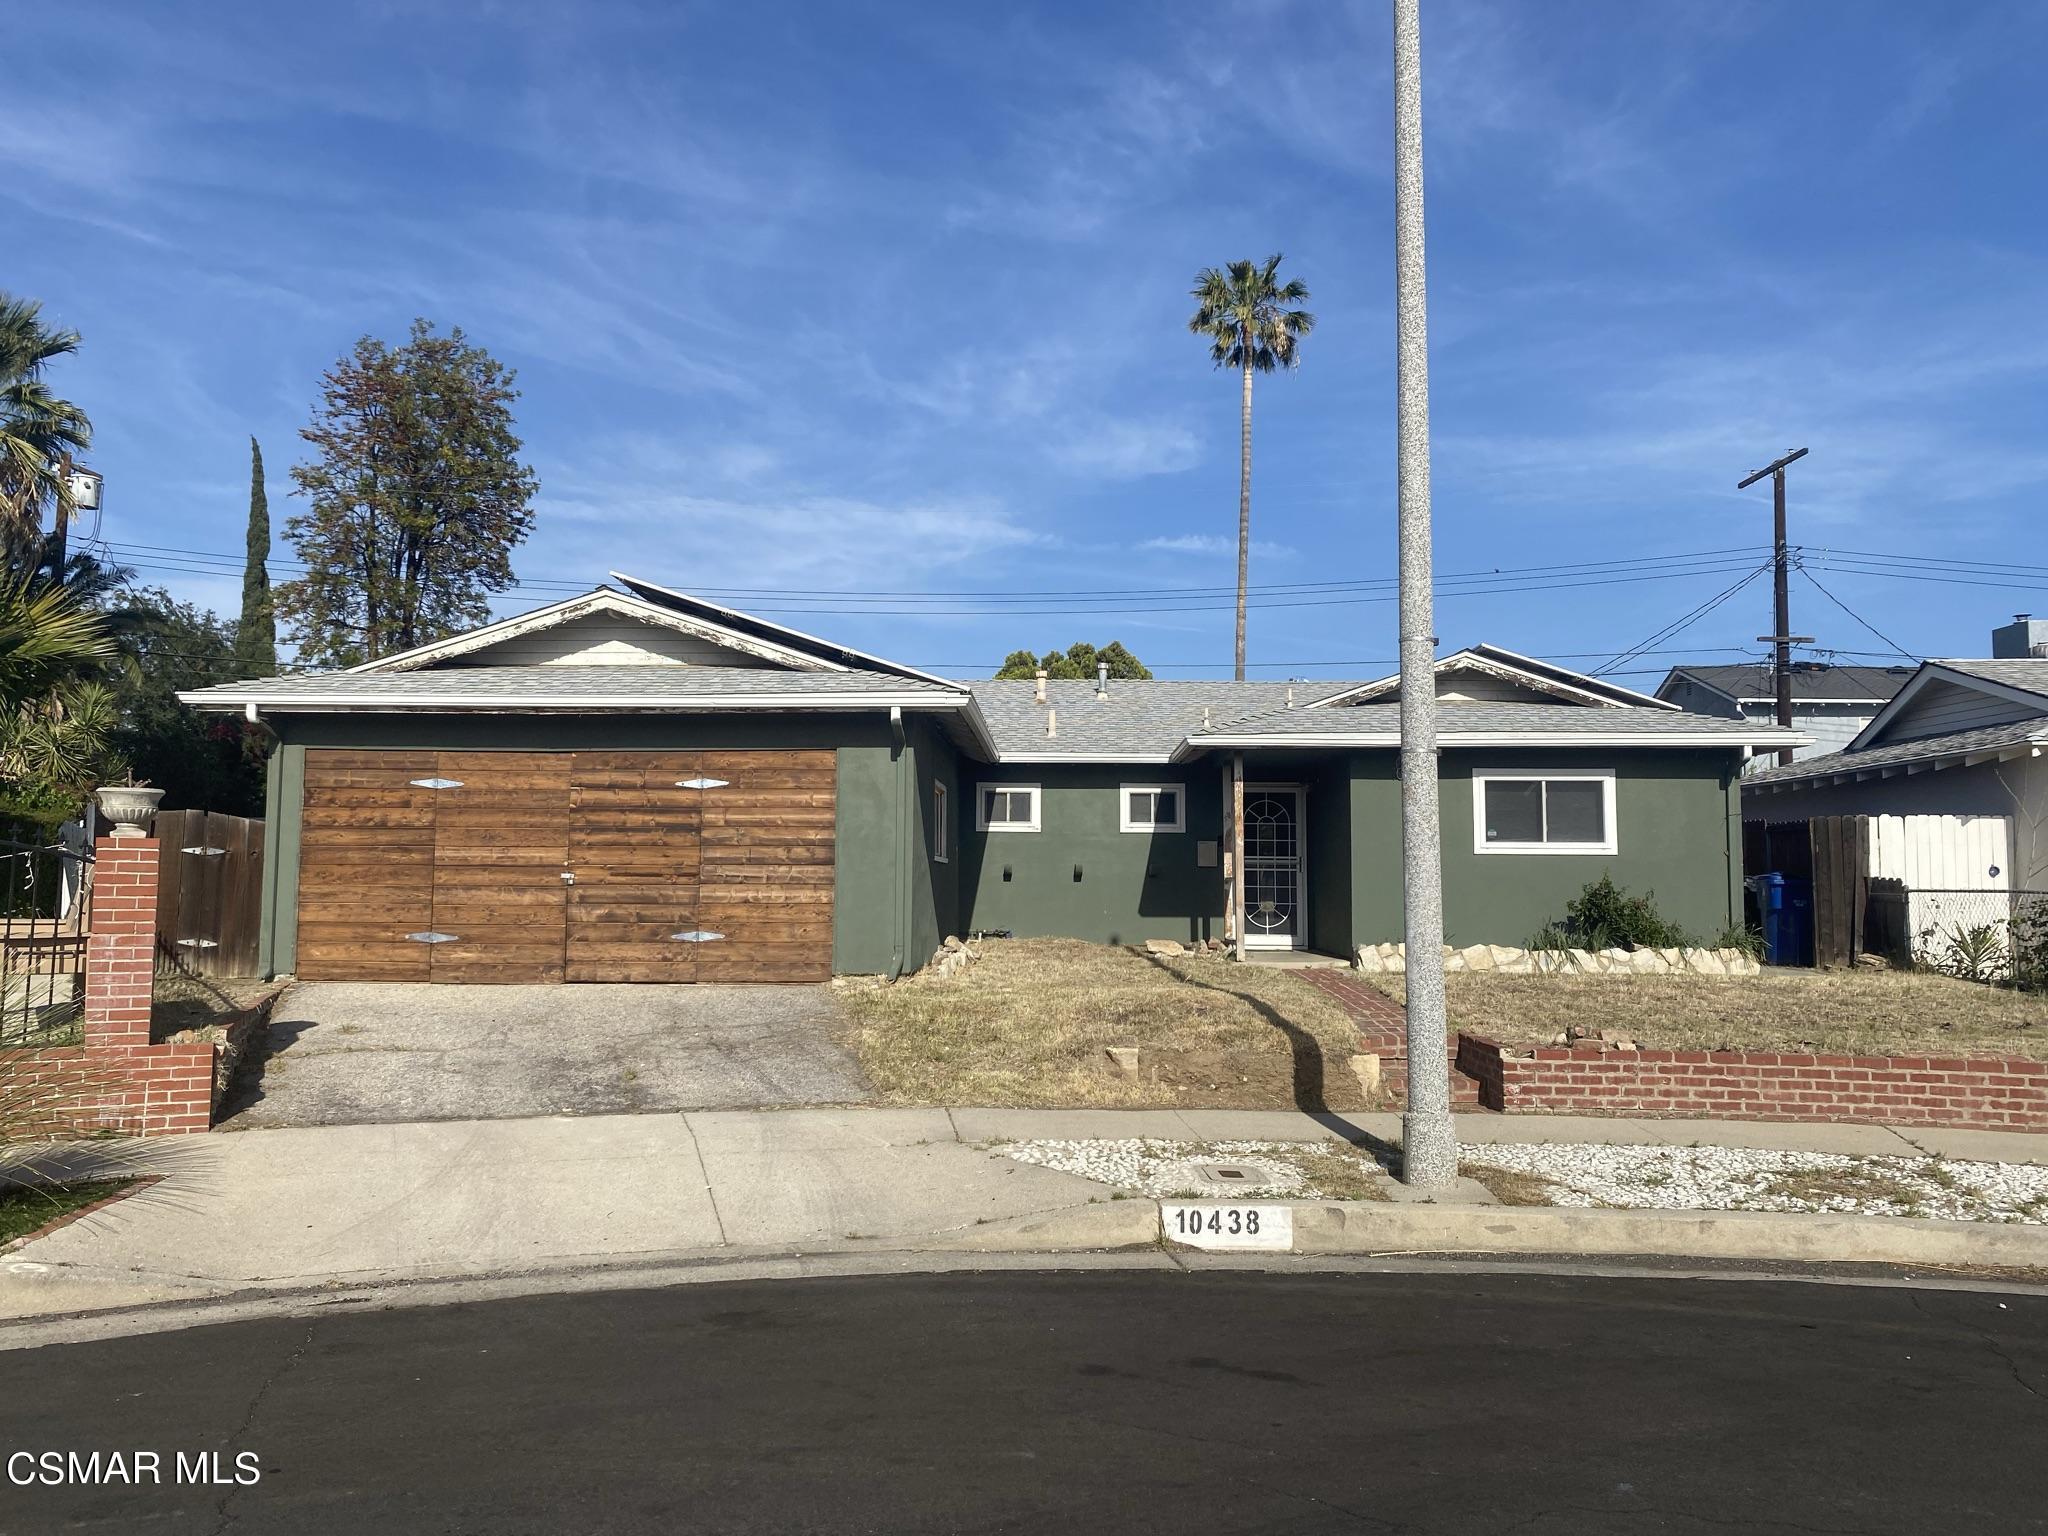 Photo of 10438 Remmet Avenue, Chatsworth, CA 91311